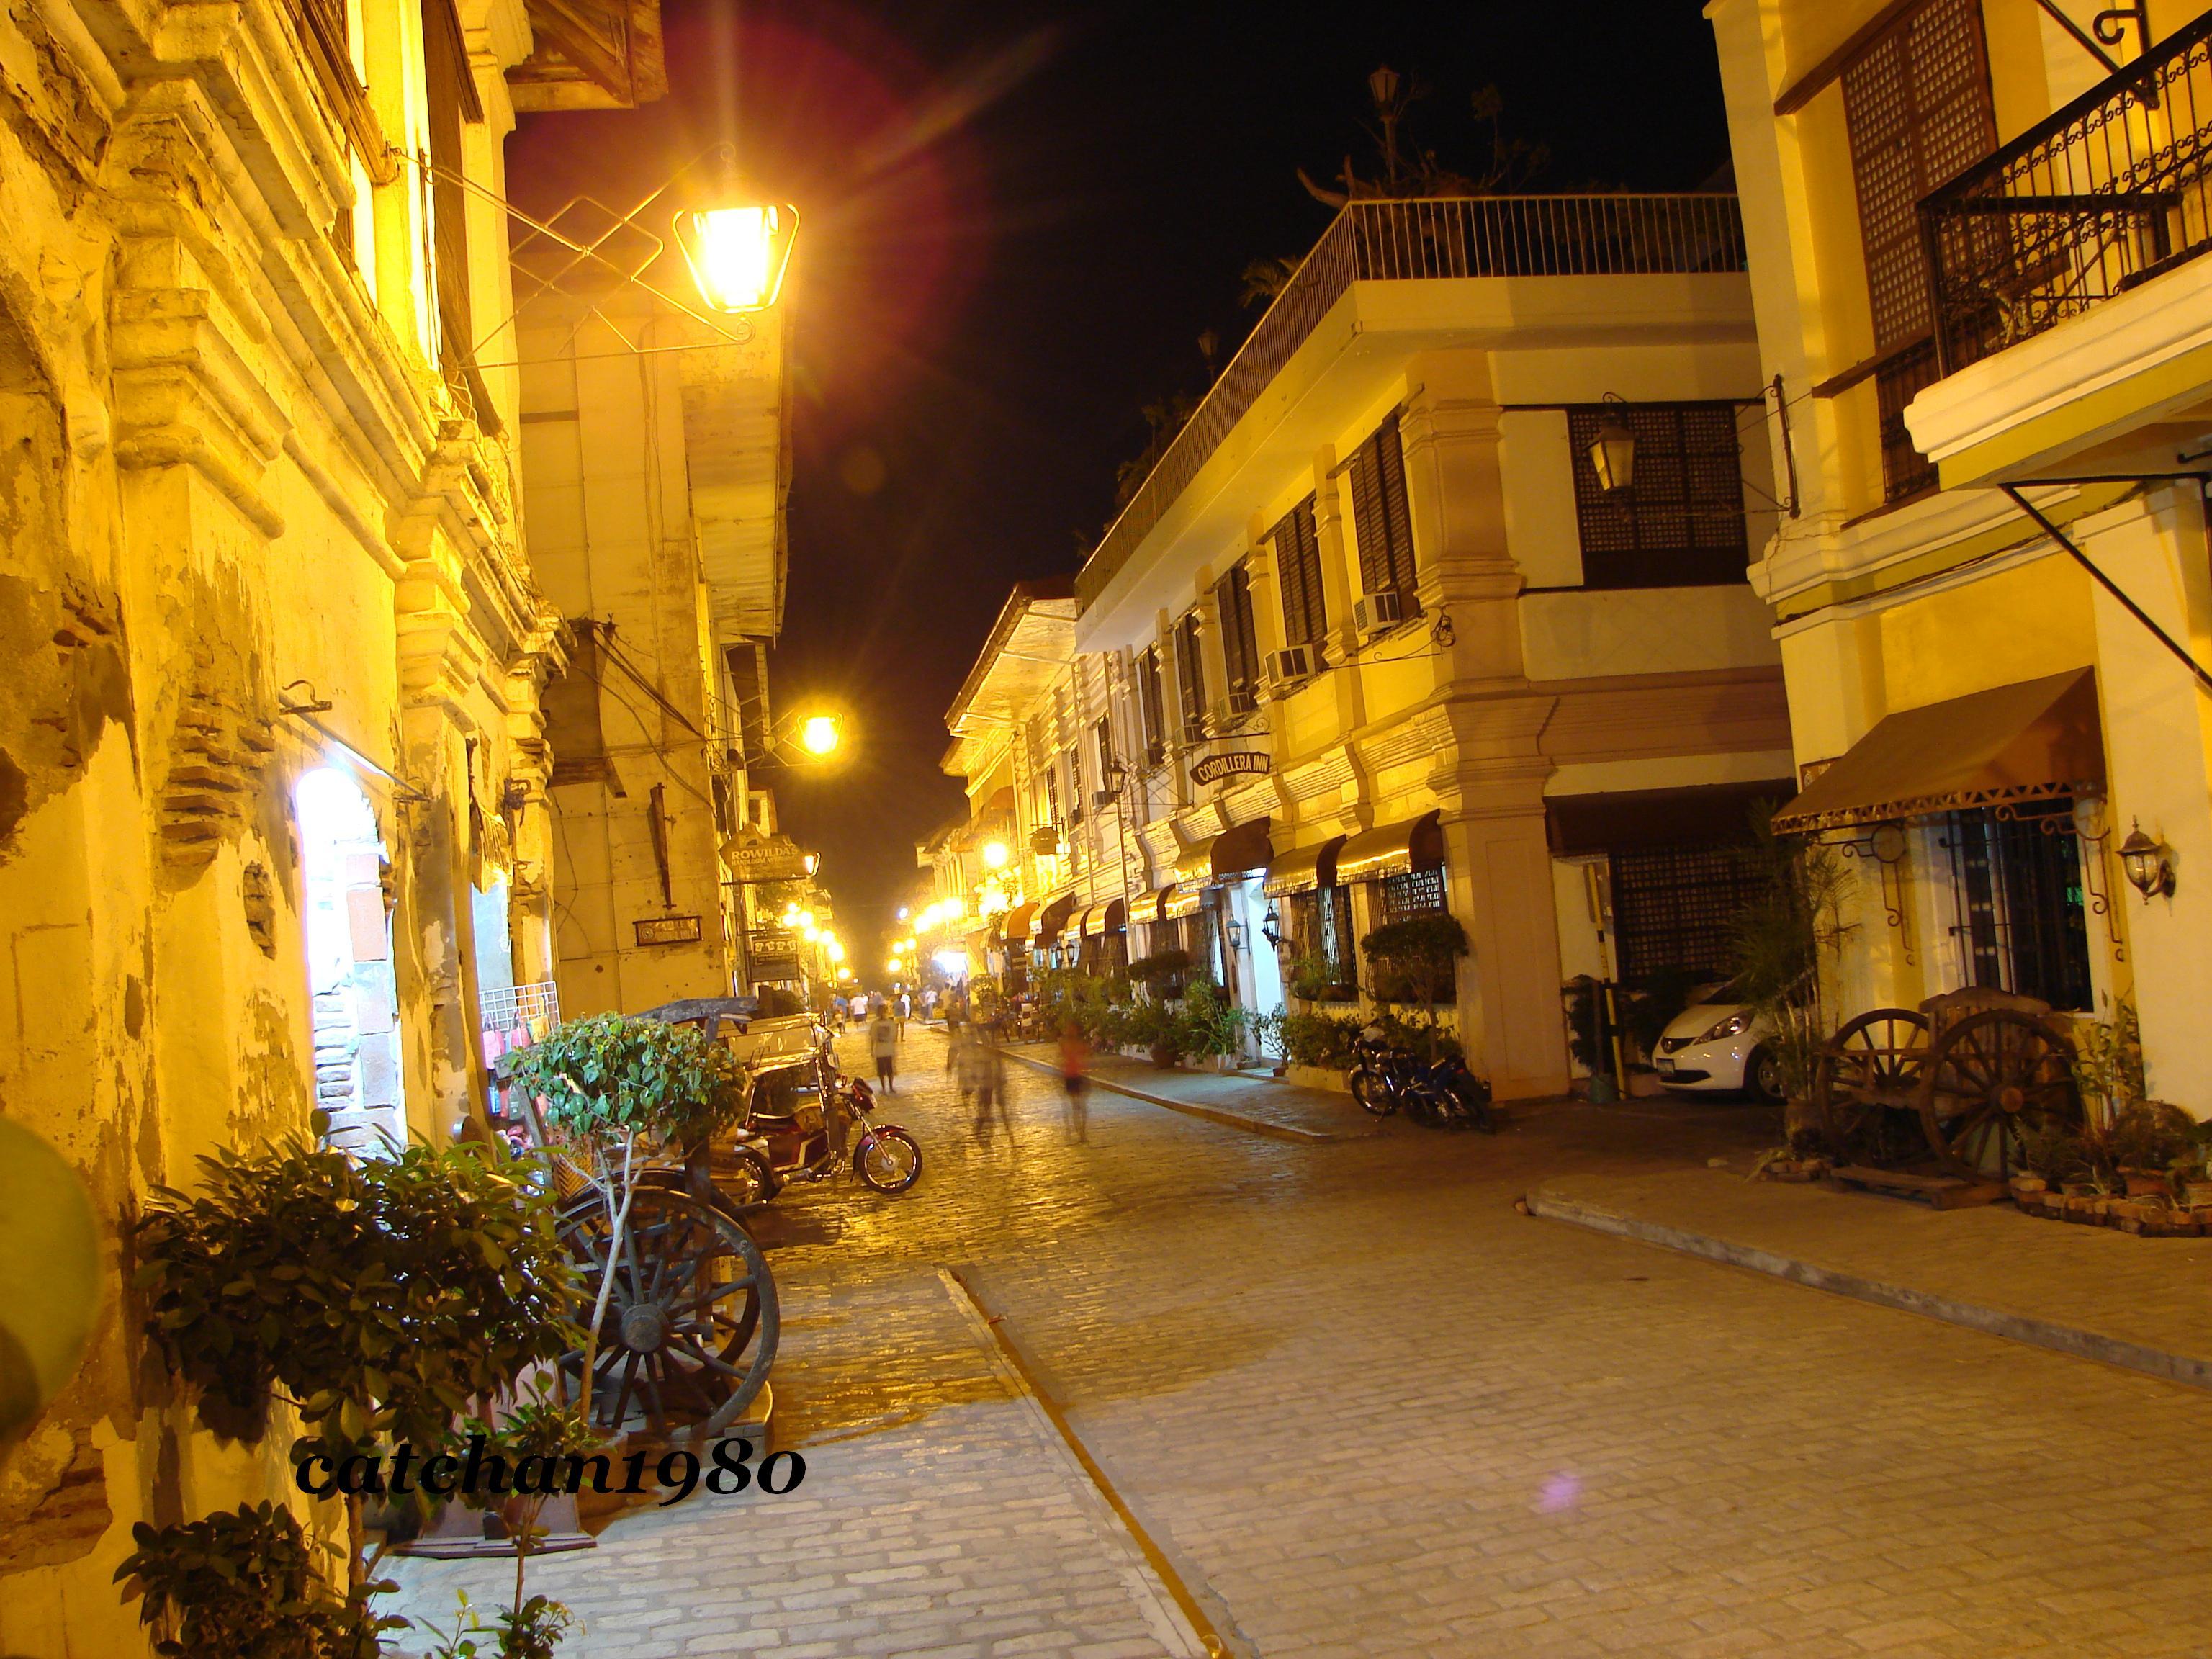 Viva Vigan: Calle Mena Crisologo